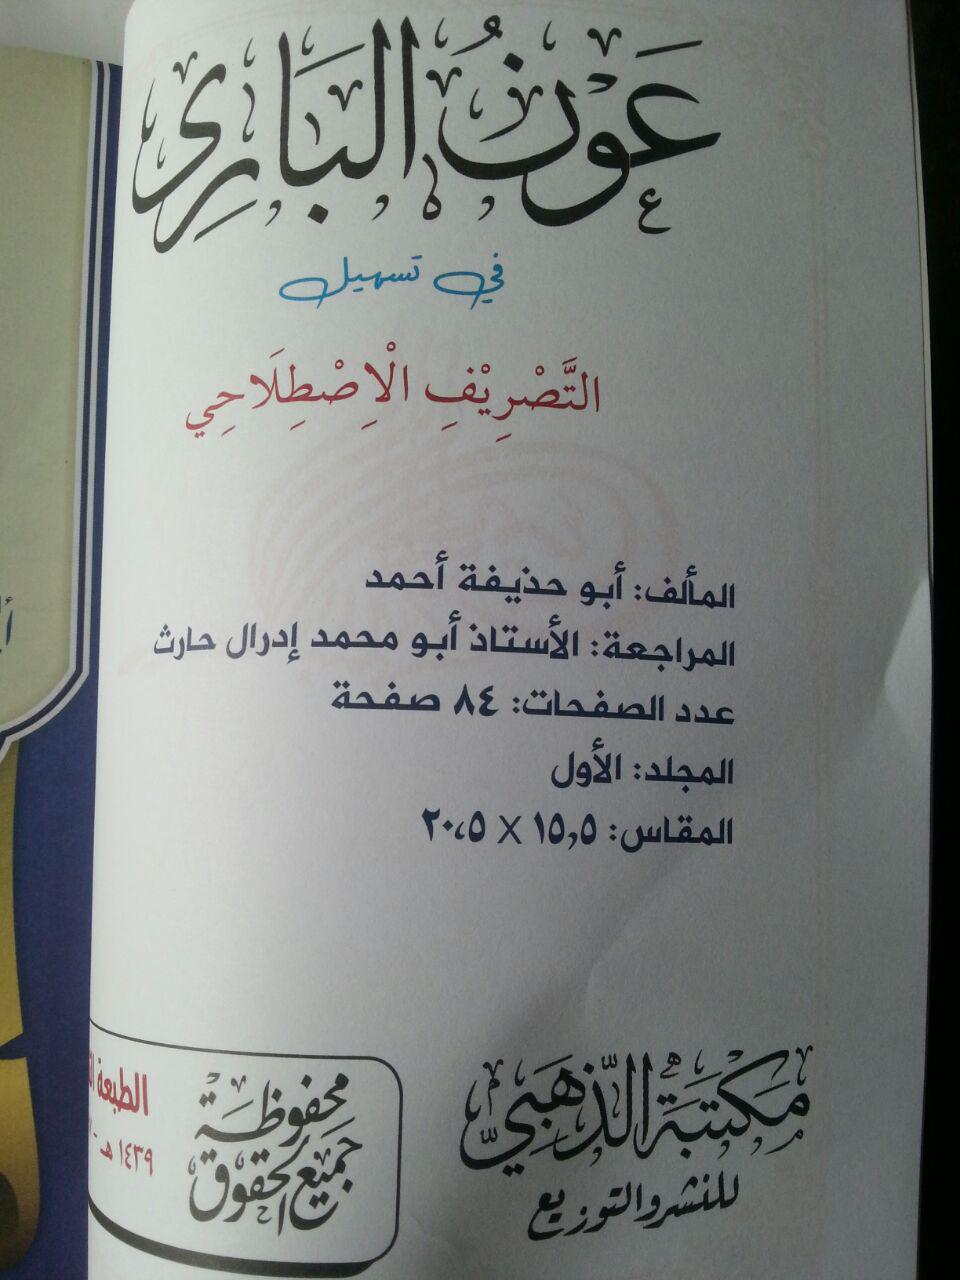 http://toko-muslim.com/images/product/2016/12/Buku-Mudah-memahami-Tashrif-Istilahi-1-Untuk-Pemula-isi.jpg